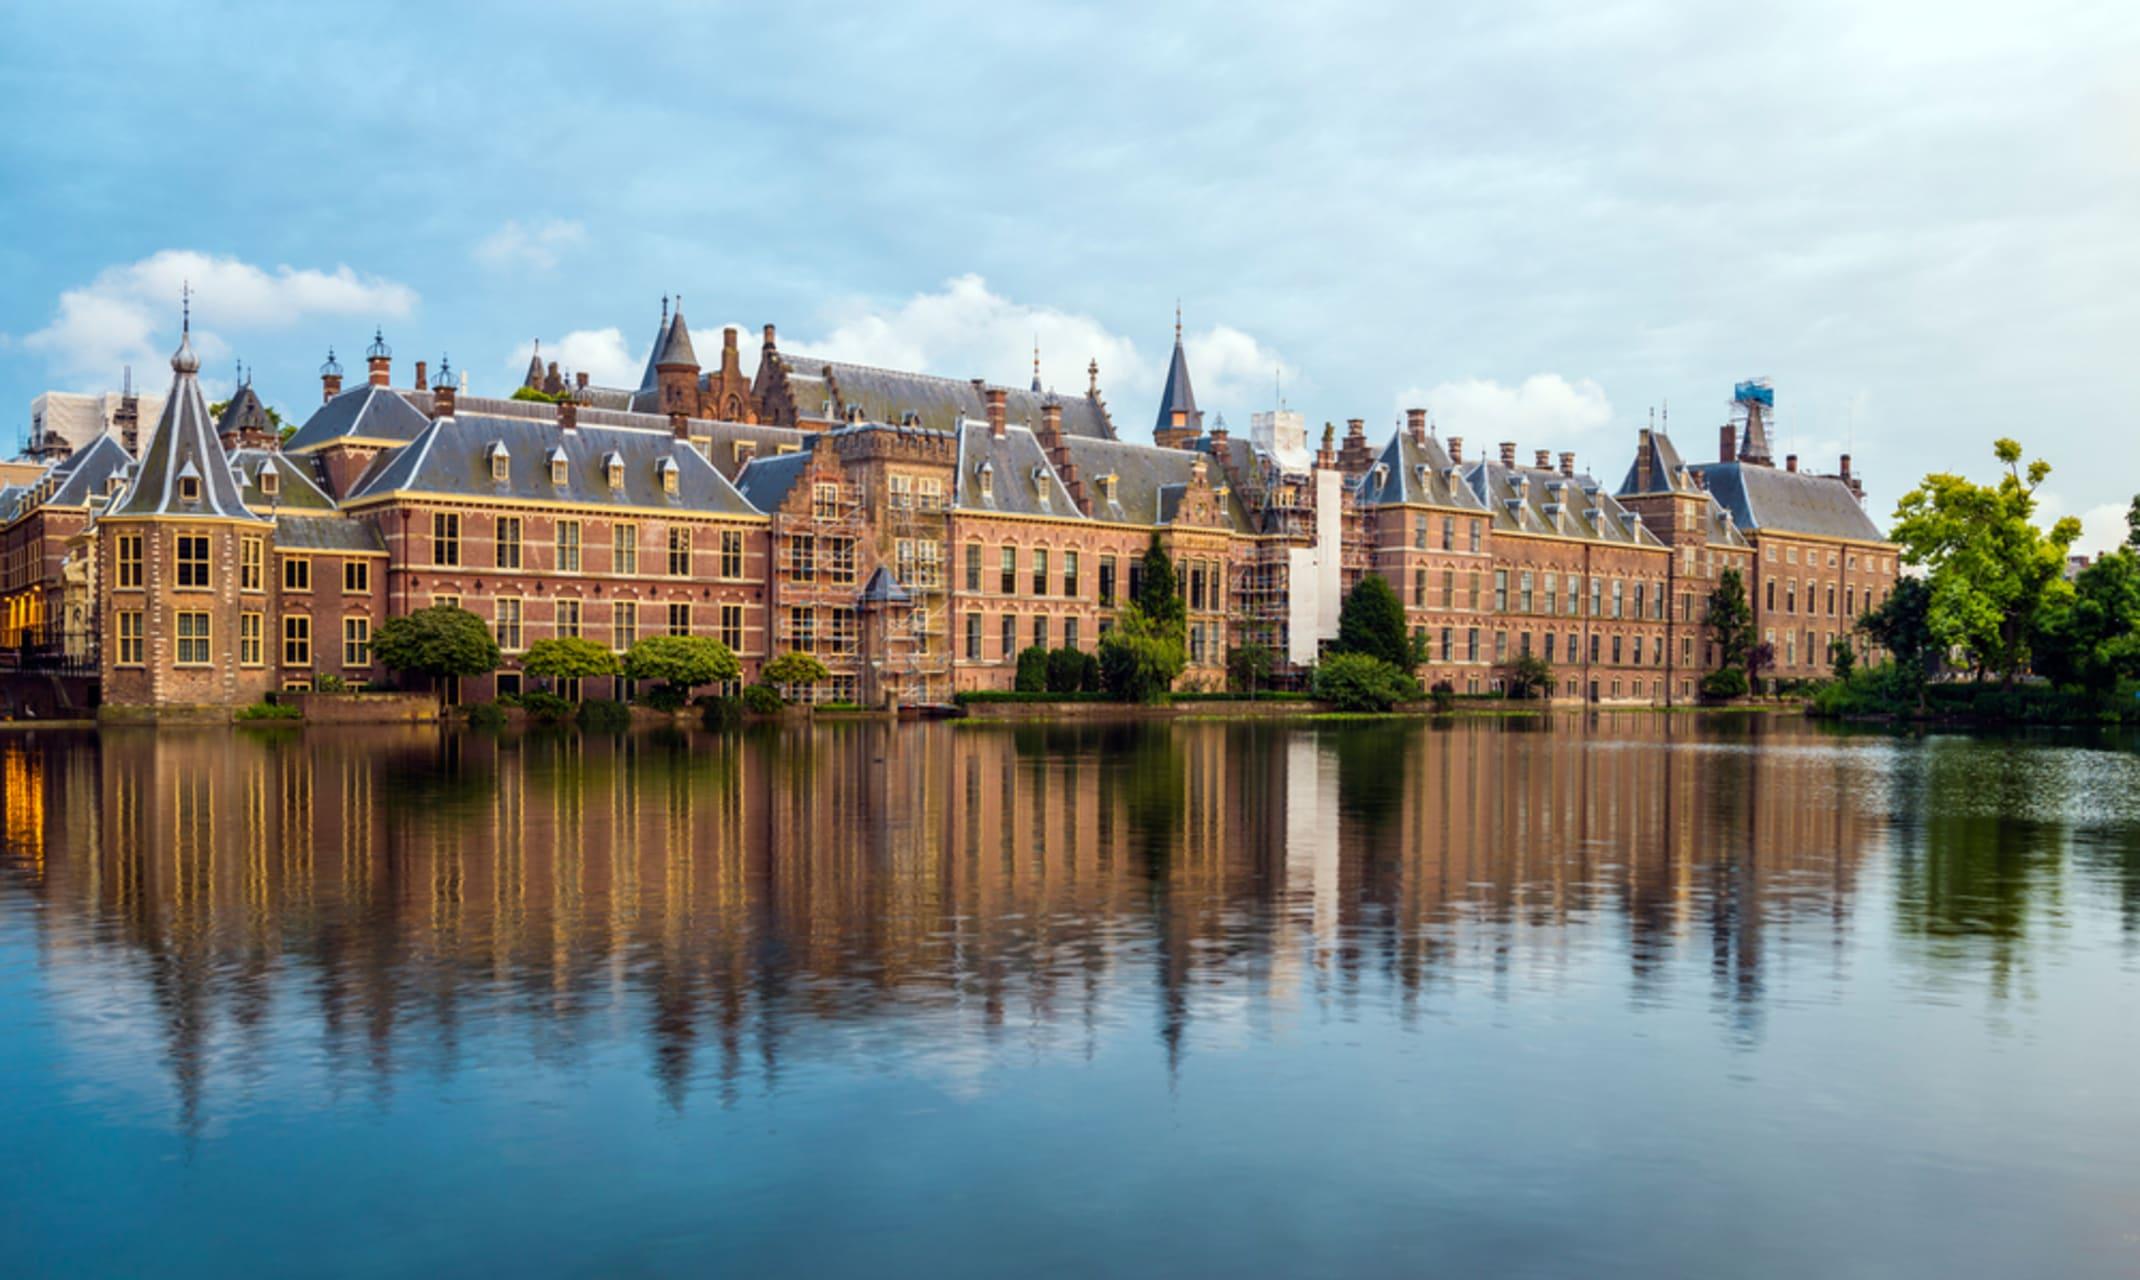 The Hague - Bike the Dutch cities 1.  The Hague, the Royal city.